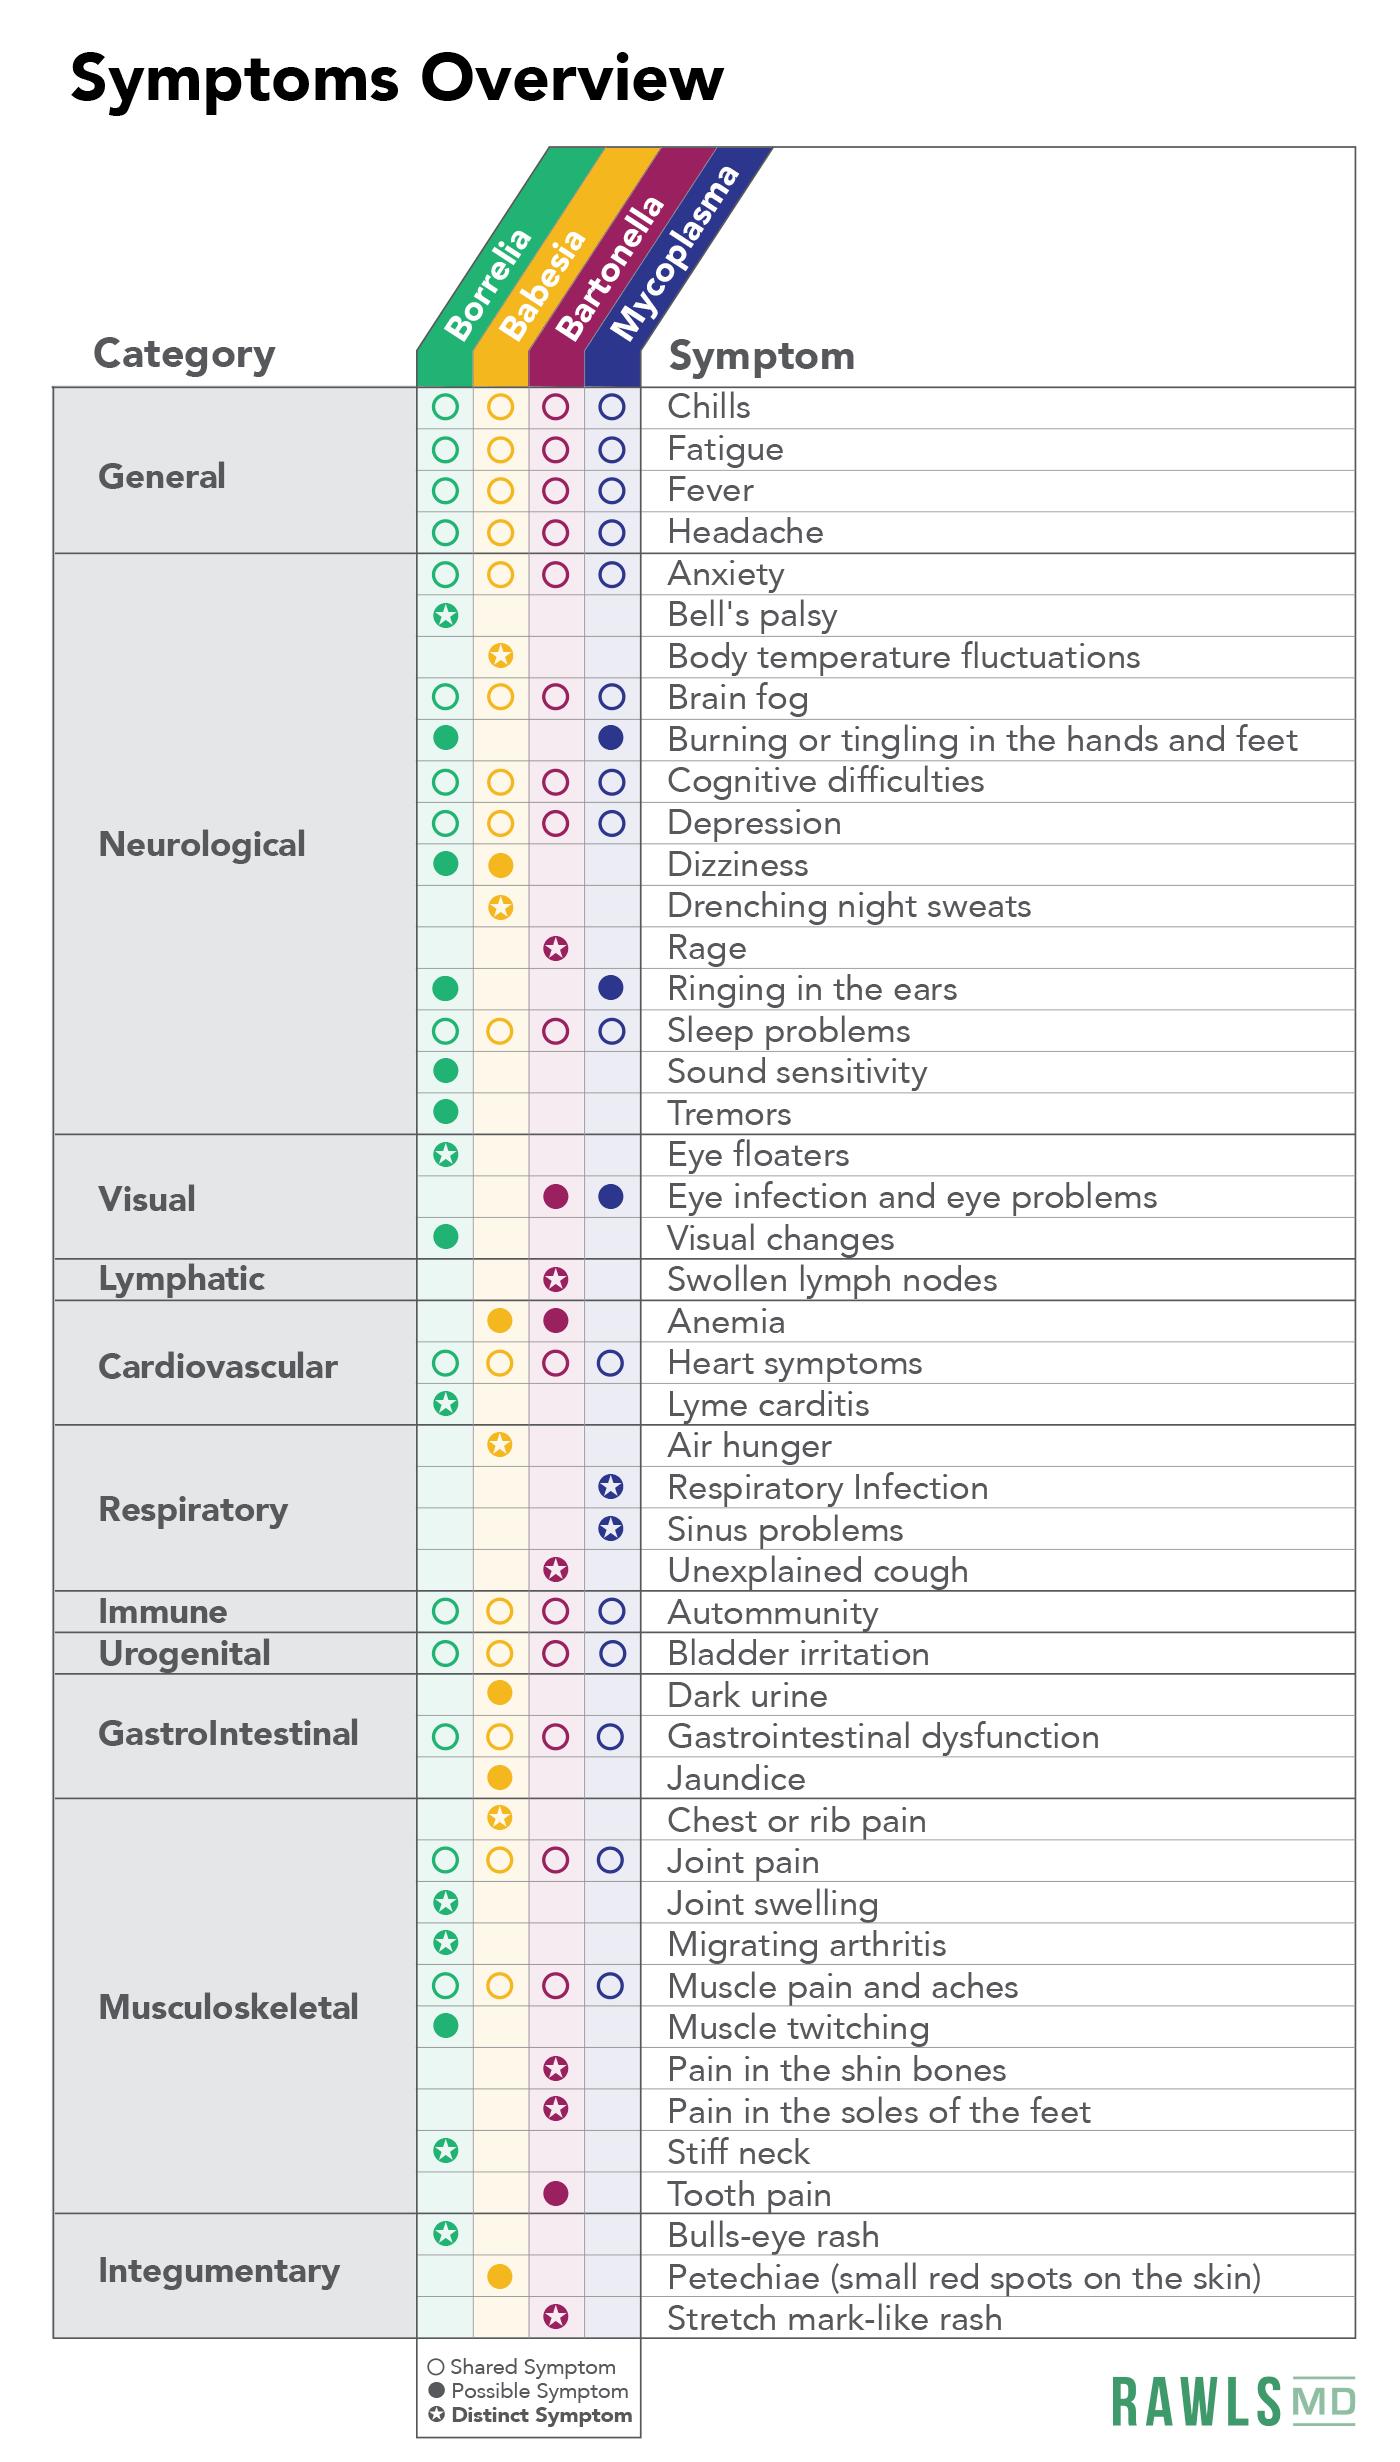 chart marking borrelia, babesia, bartonella, and mycoplasma for general, neurological, visual, lymphatic, cardiovascular, respiratory, immune, urogenital, gastrointestinal, musculoskeletal, or integumentary symptoms